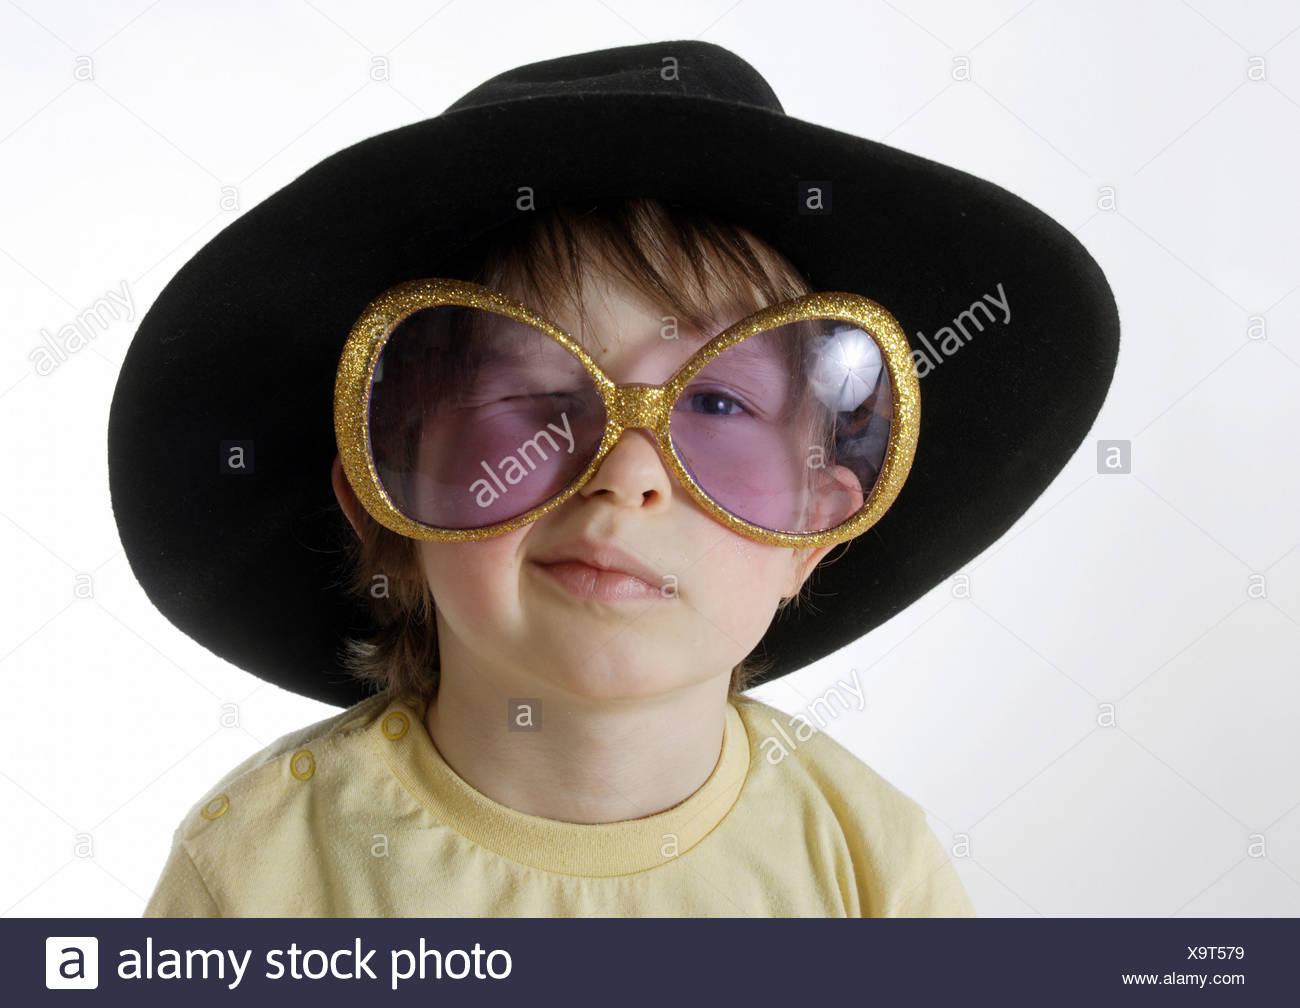 9c1e689d7d72e Kid Wearing Sunglasses Stock Photos   Kid Wearing Sunglasses Stock ...